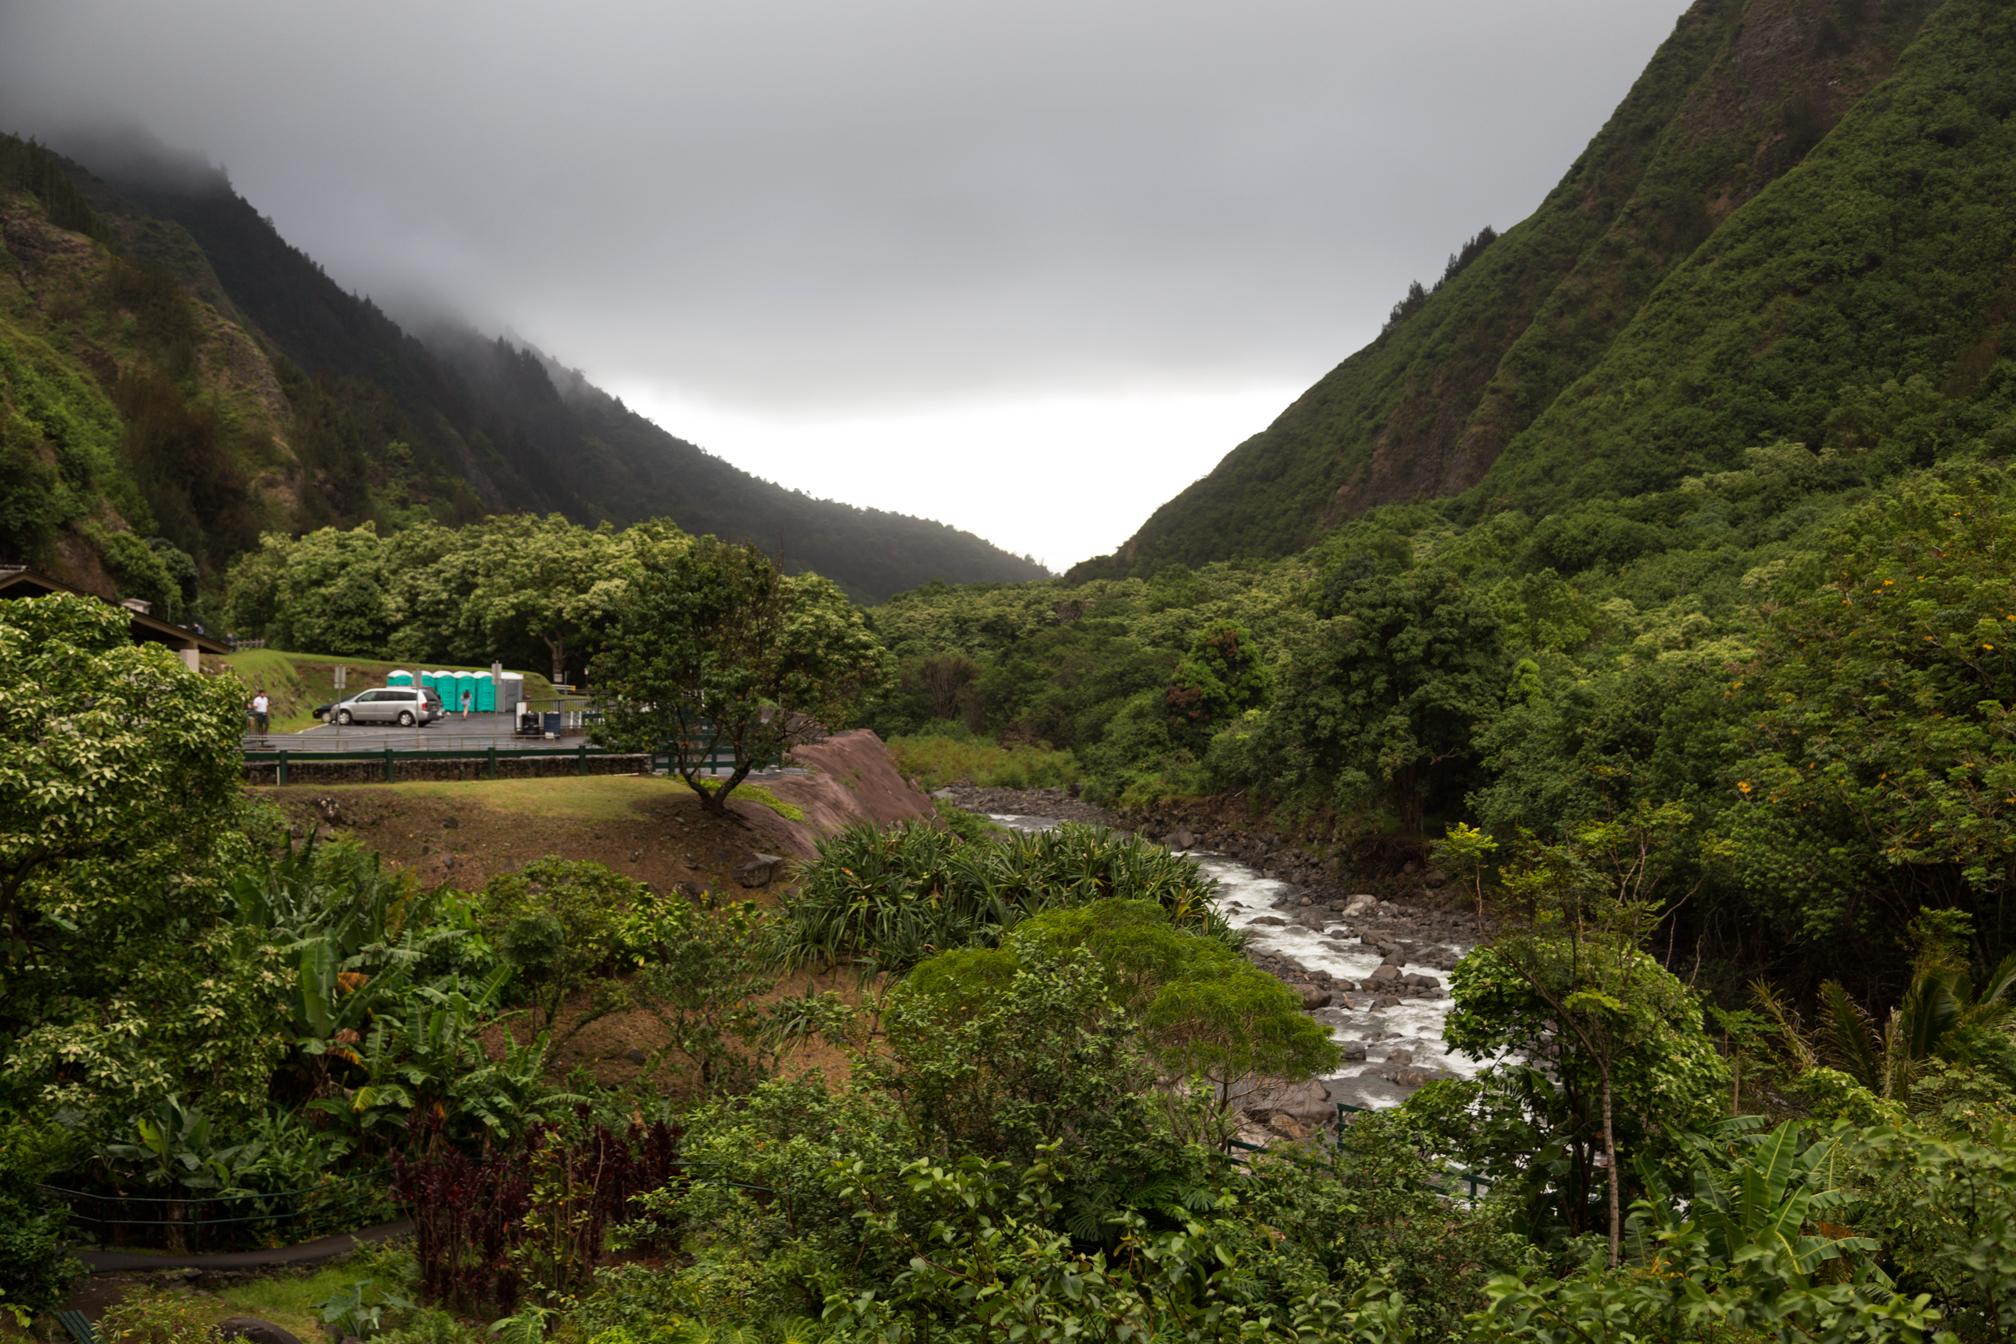 'Iao Valley State Park, Maui